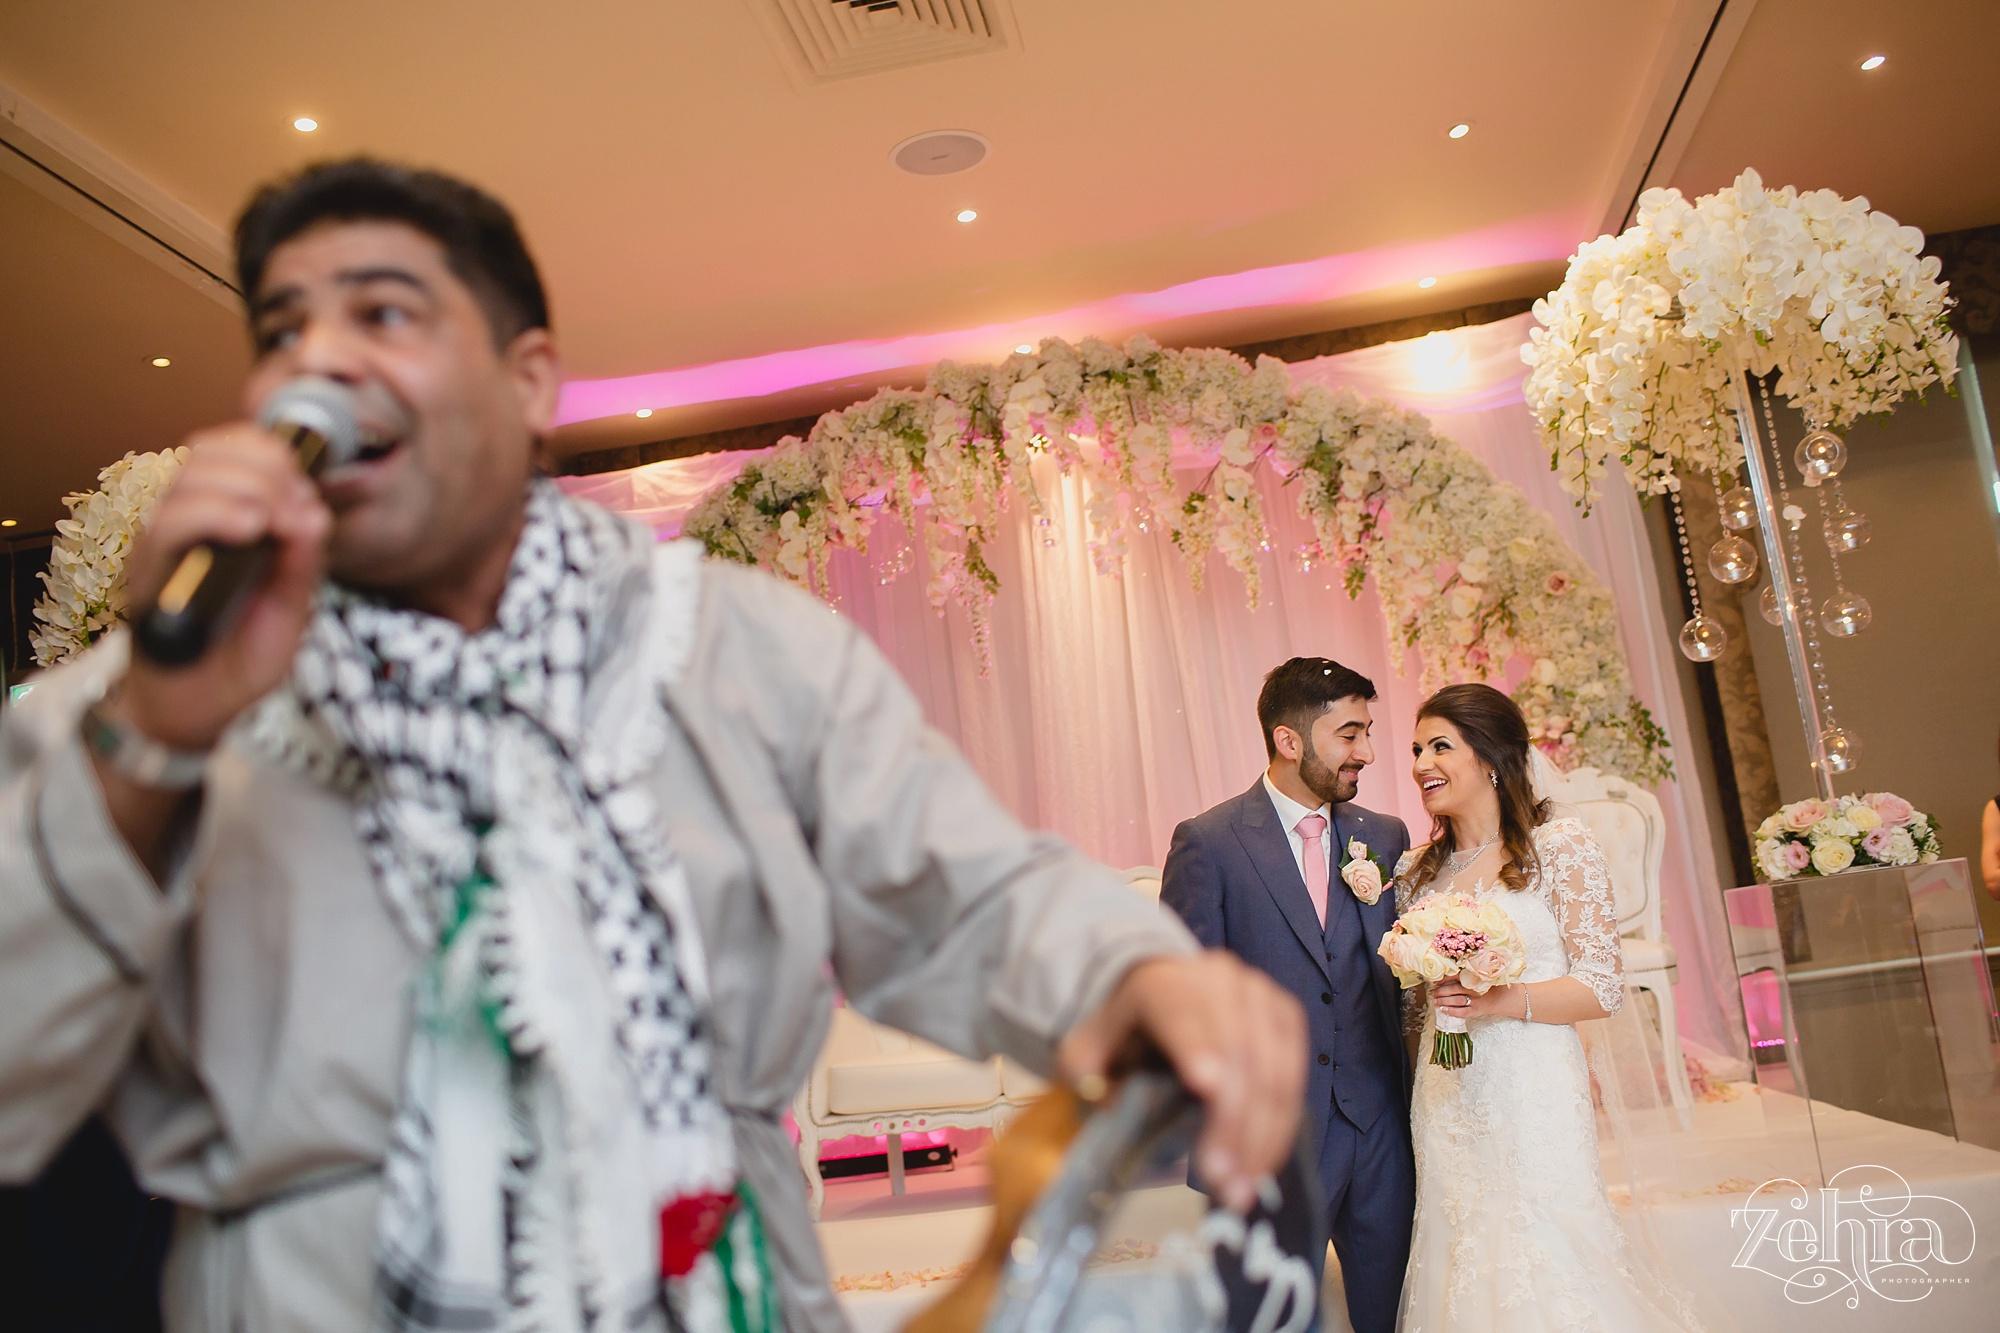 zehra photographer mere cheshire wedding_0033.jpg